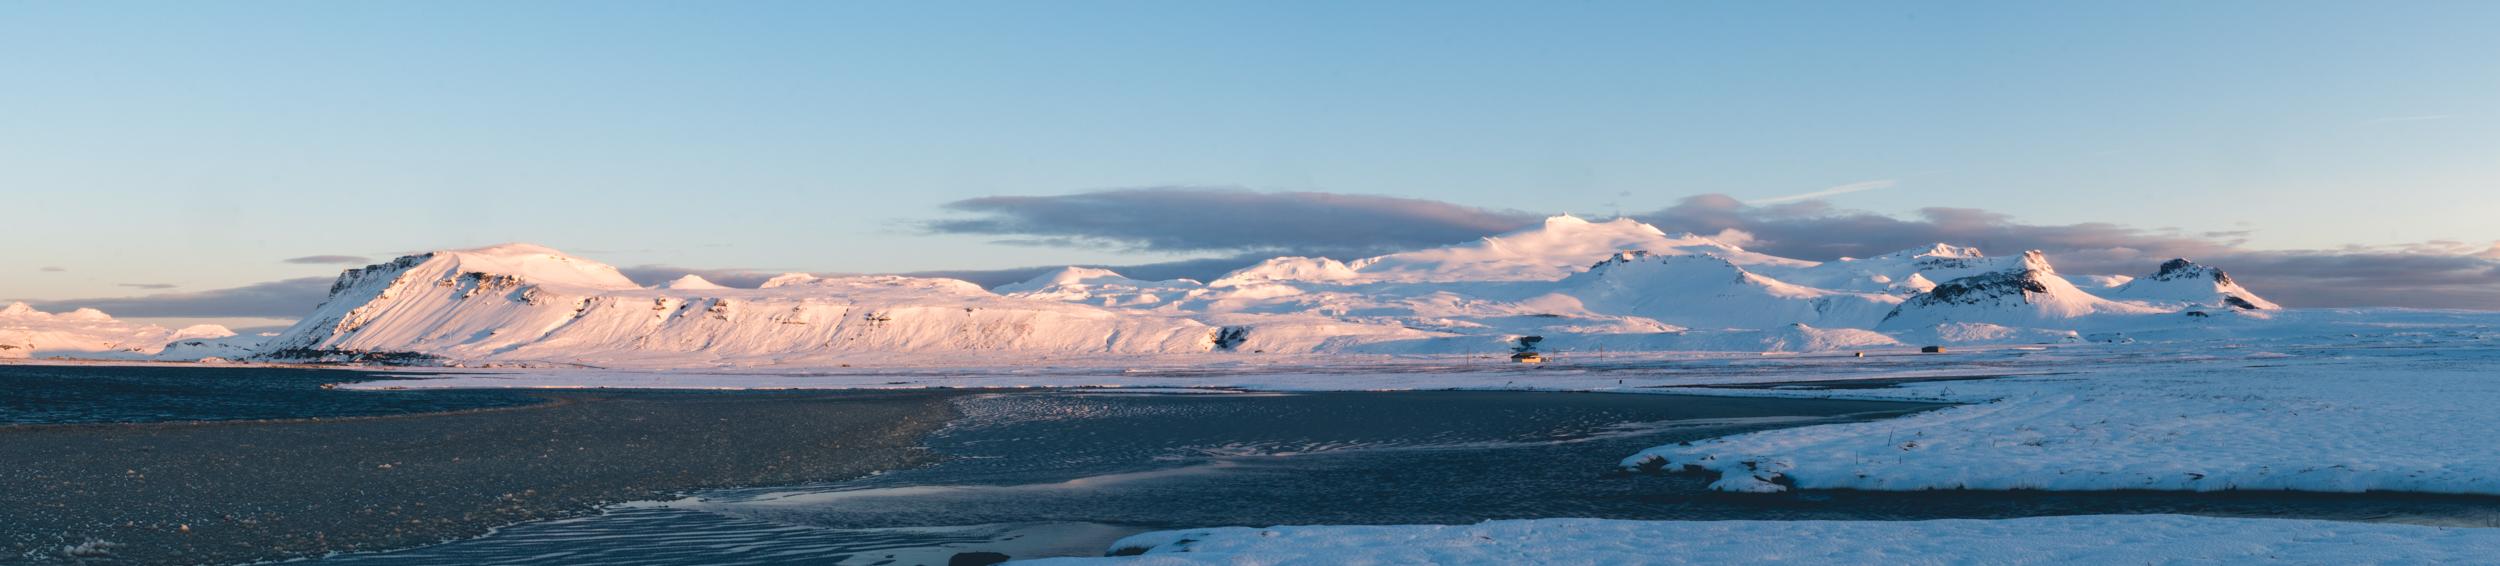 1803_Iceland-107.jpg